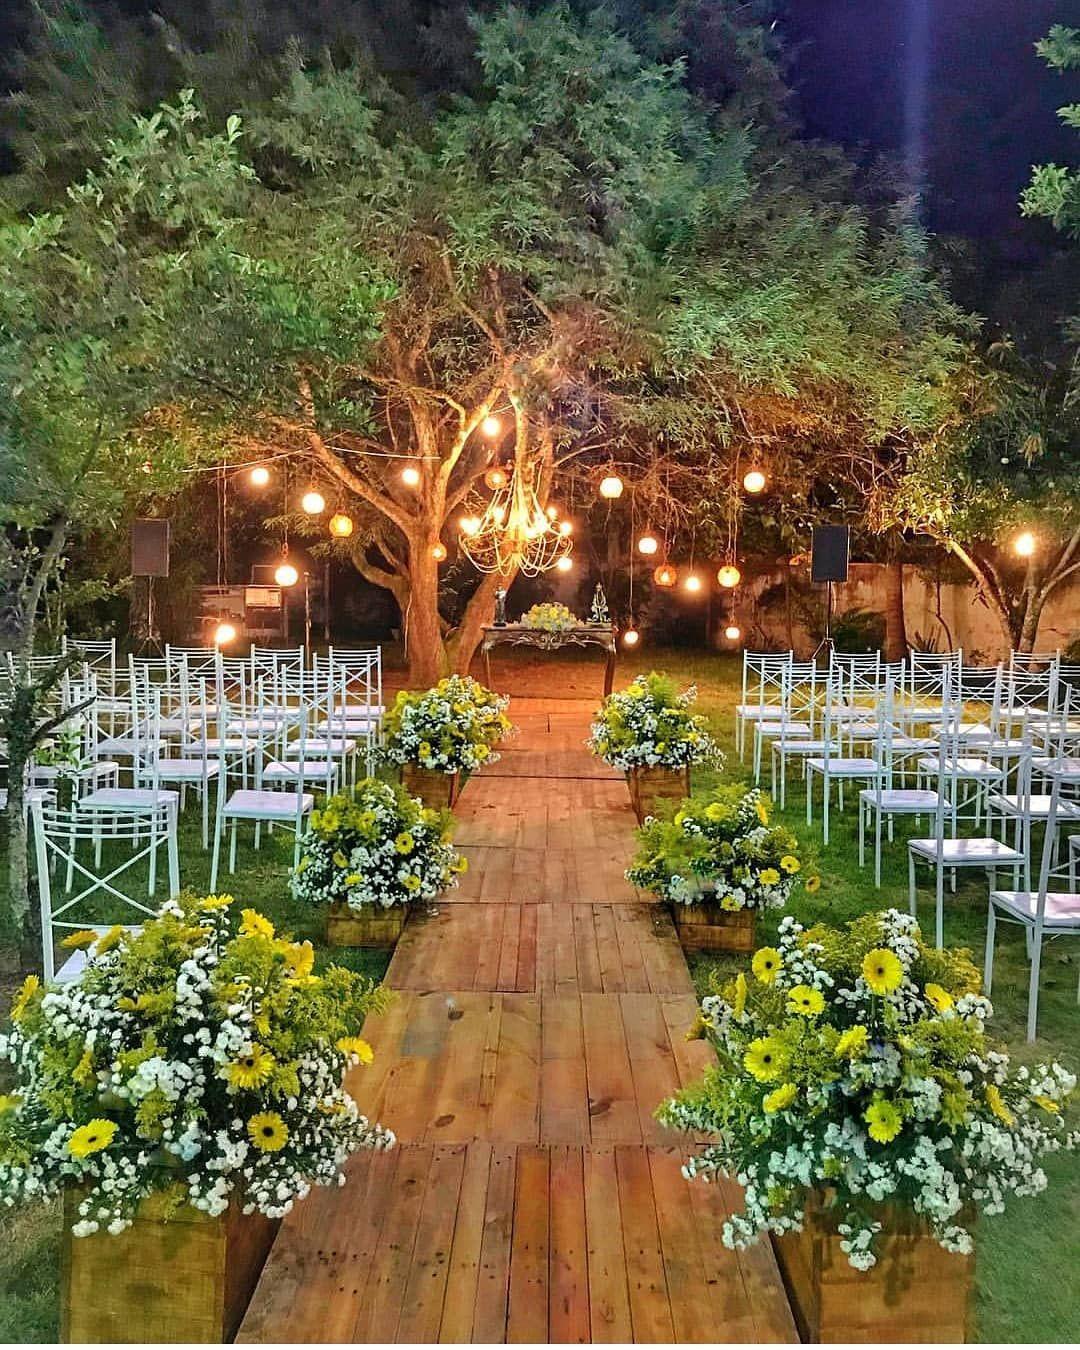 Cenario Perfeito Siga Noiva Inlove Via